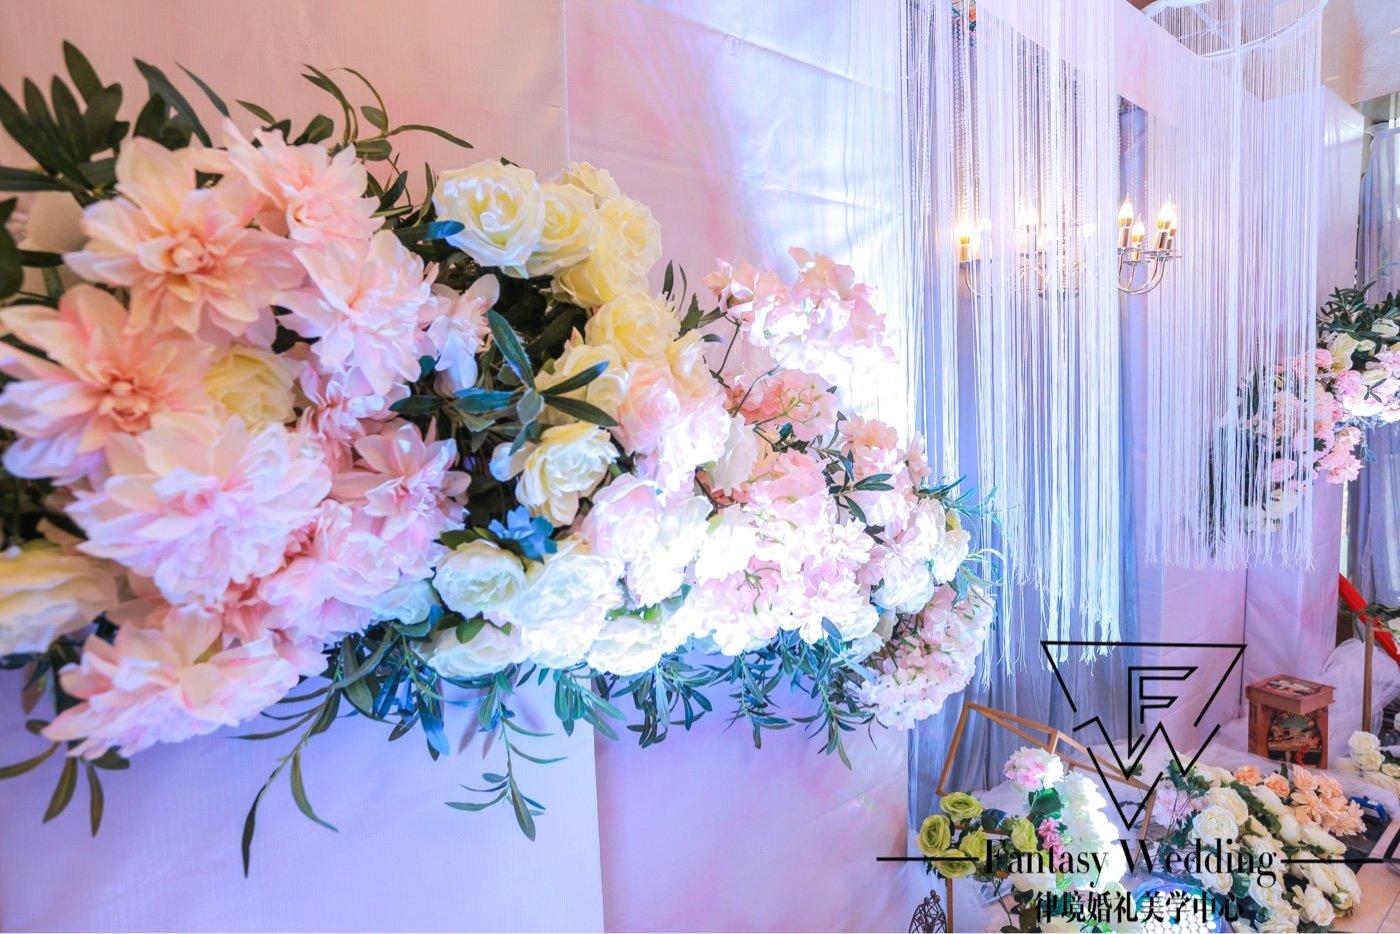 「Fantasy Wedding」&琪瑞康郡「遇见」主题13